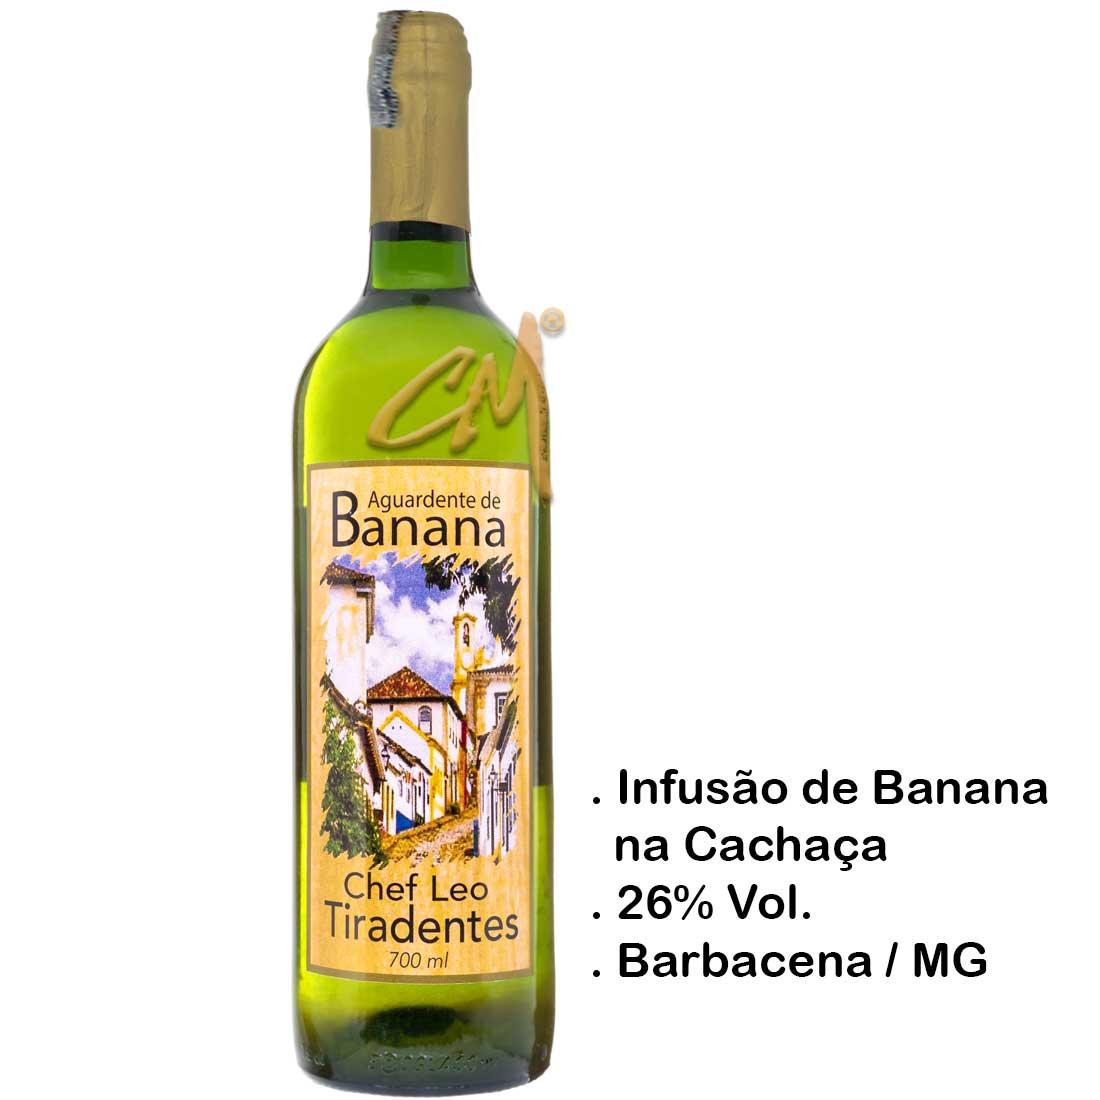 Infusão Bananinha Chef Leo 700 ml (Barbacena - MG)